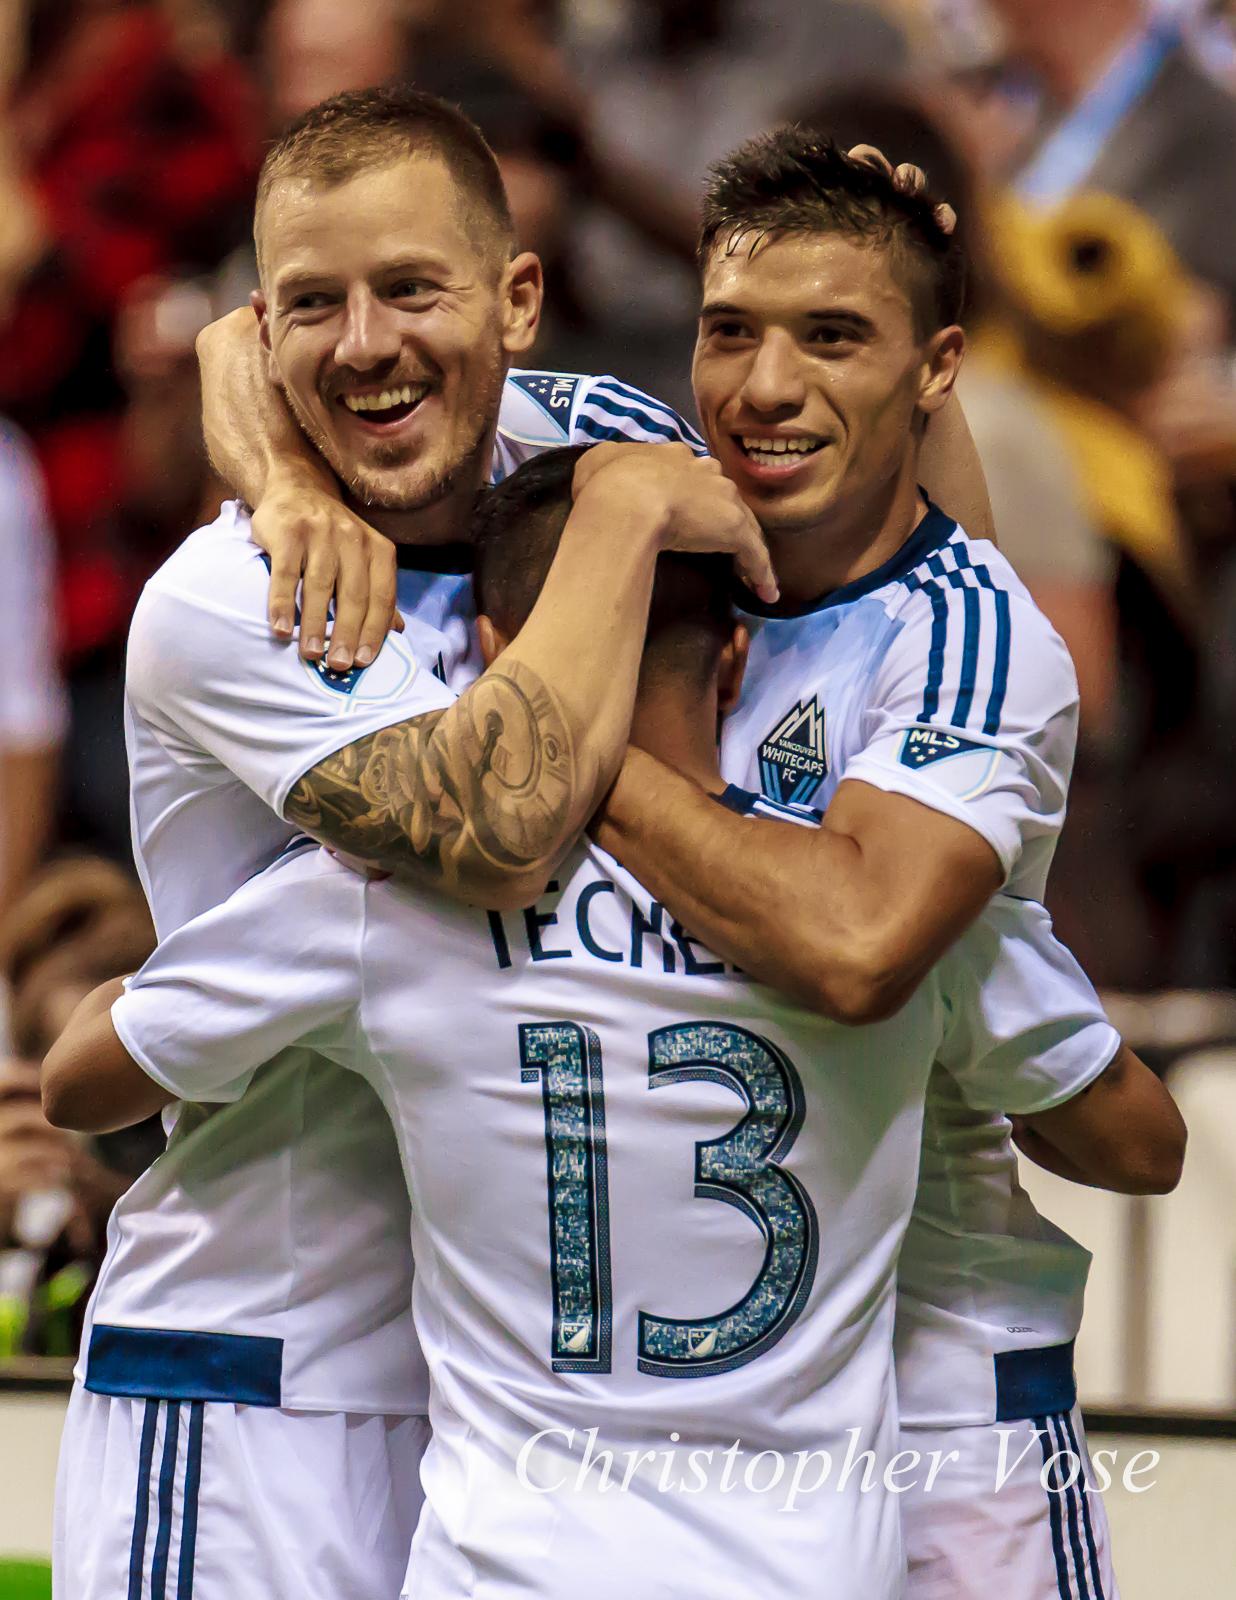 2015-08-08 Cristian Techera's First Goal Celebration 1.jpg